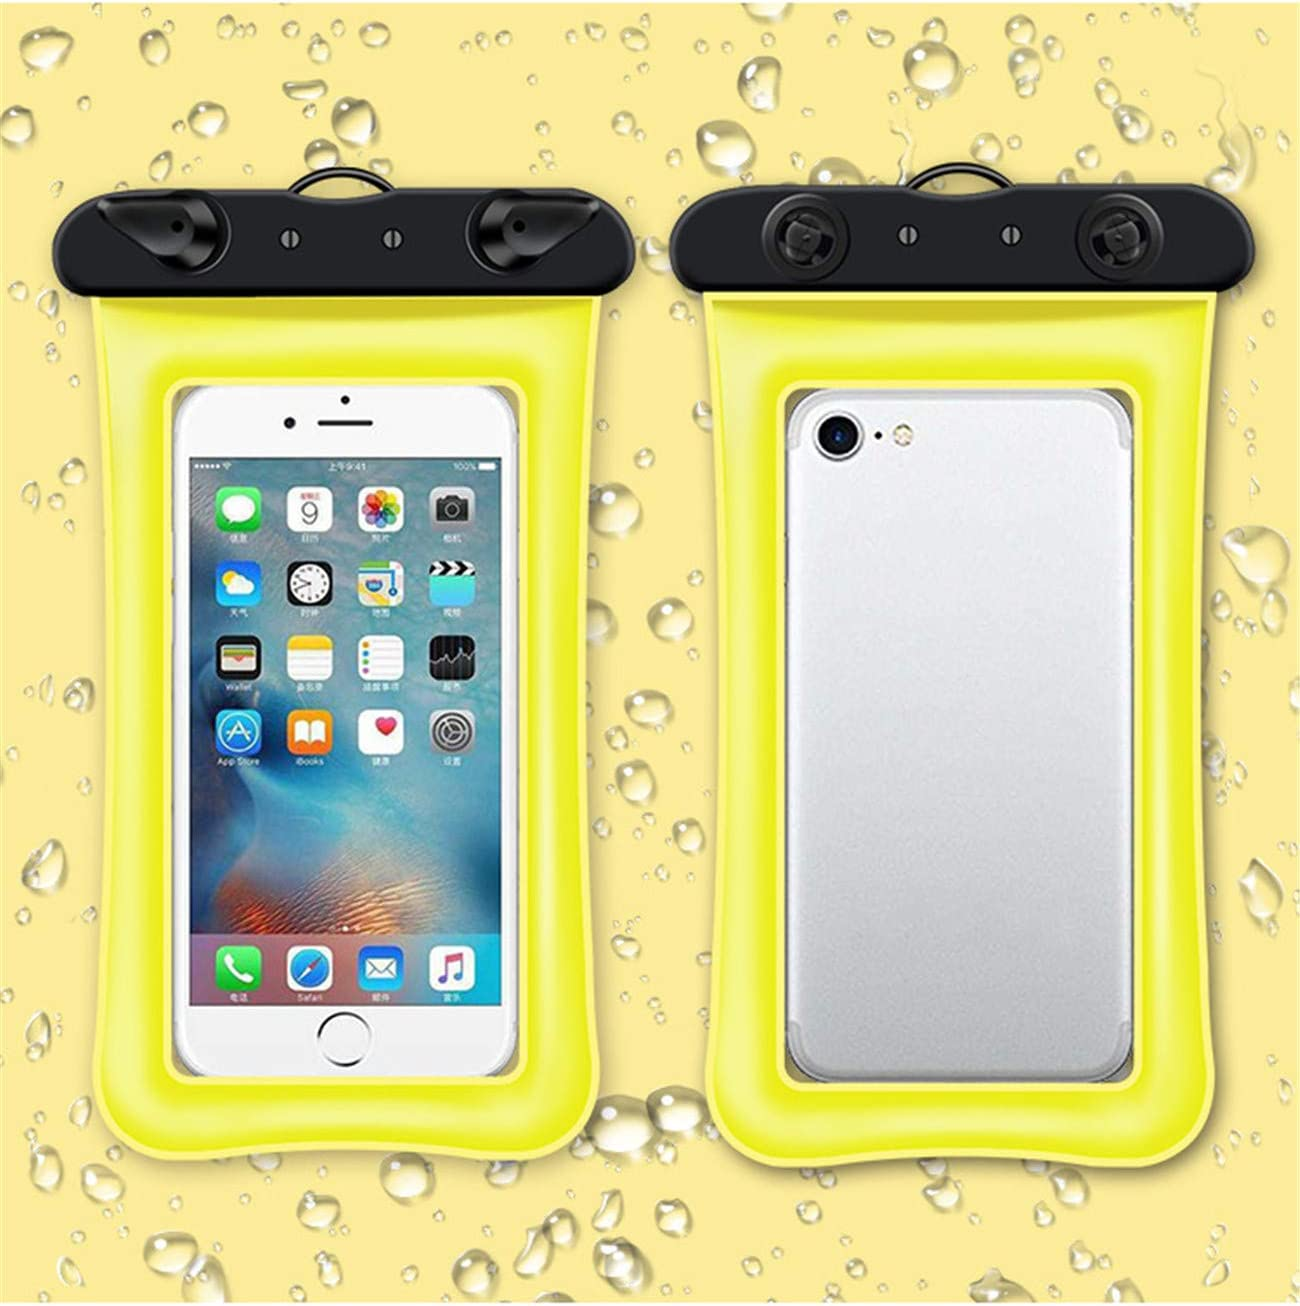 LNLW Diving Swimming Underwater Photography Dustproof Anti-Fall Transparent Buoyancy Waterproof Mobile Phone Bag 2 Pack